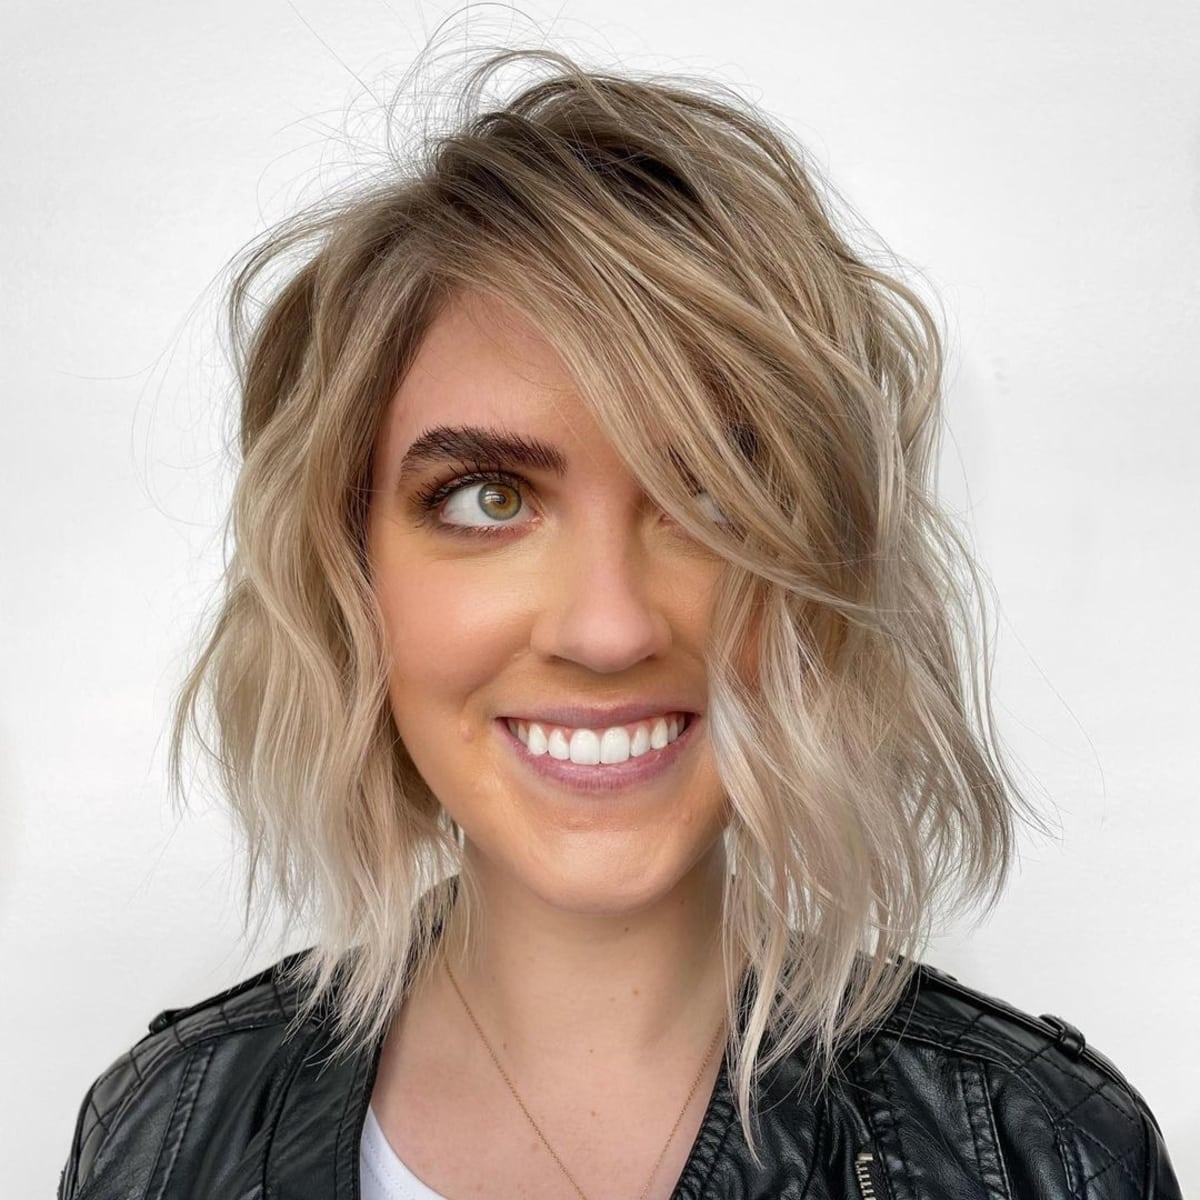 18 Long Asymmetrical Bob Haircut Ideas That Are Undeniably Flawless